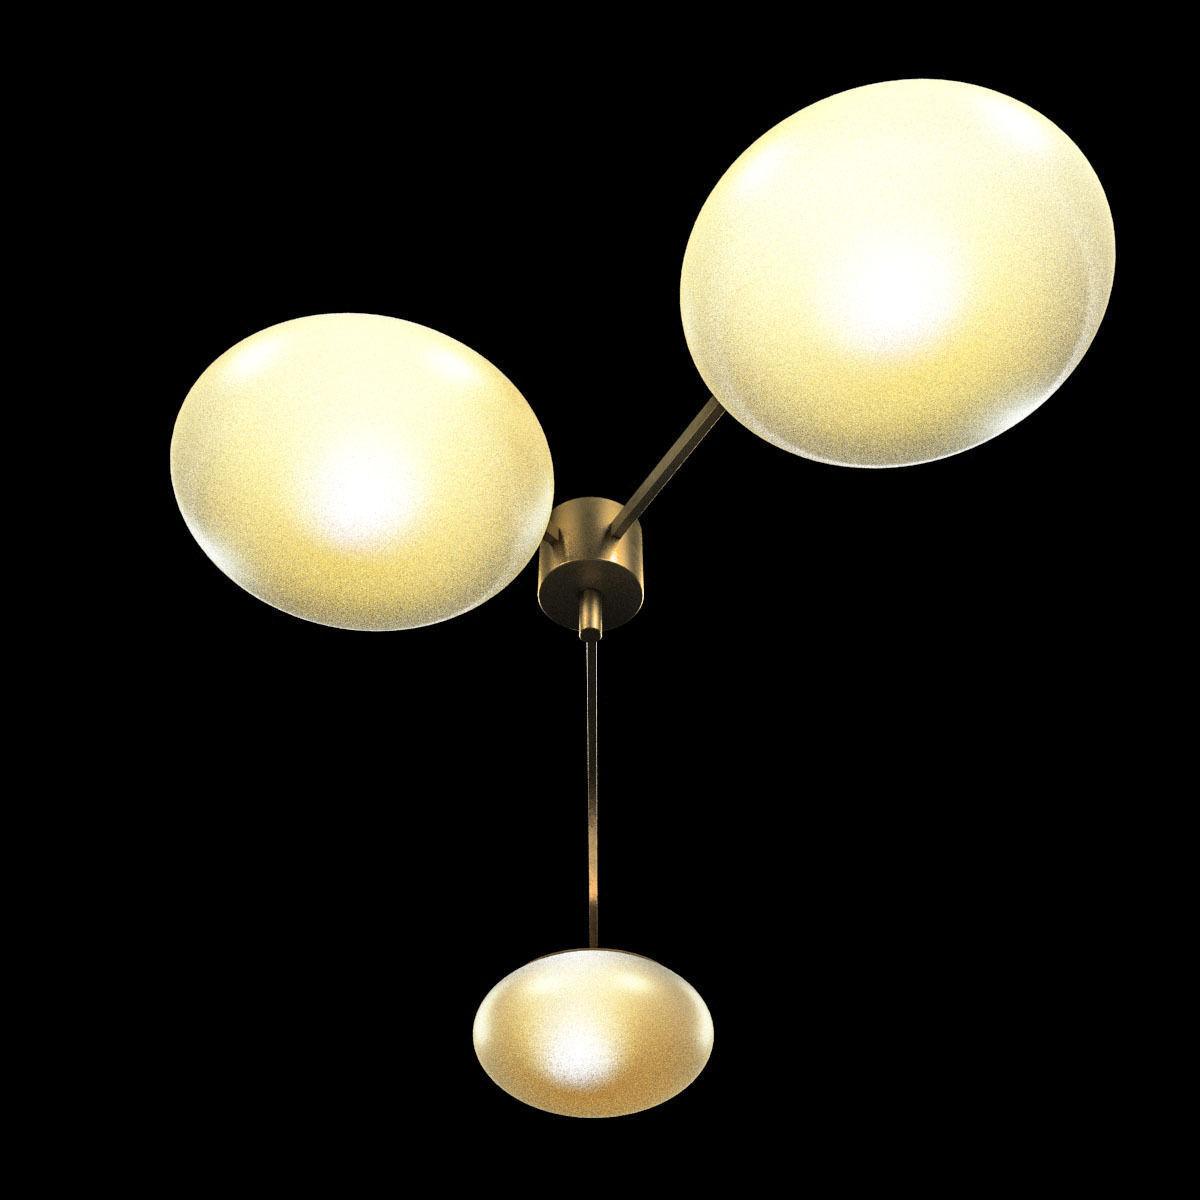 Chandelier by angelo lelli for arredoluce 3d model max obj for Arredo luce